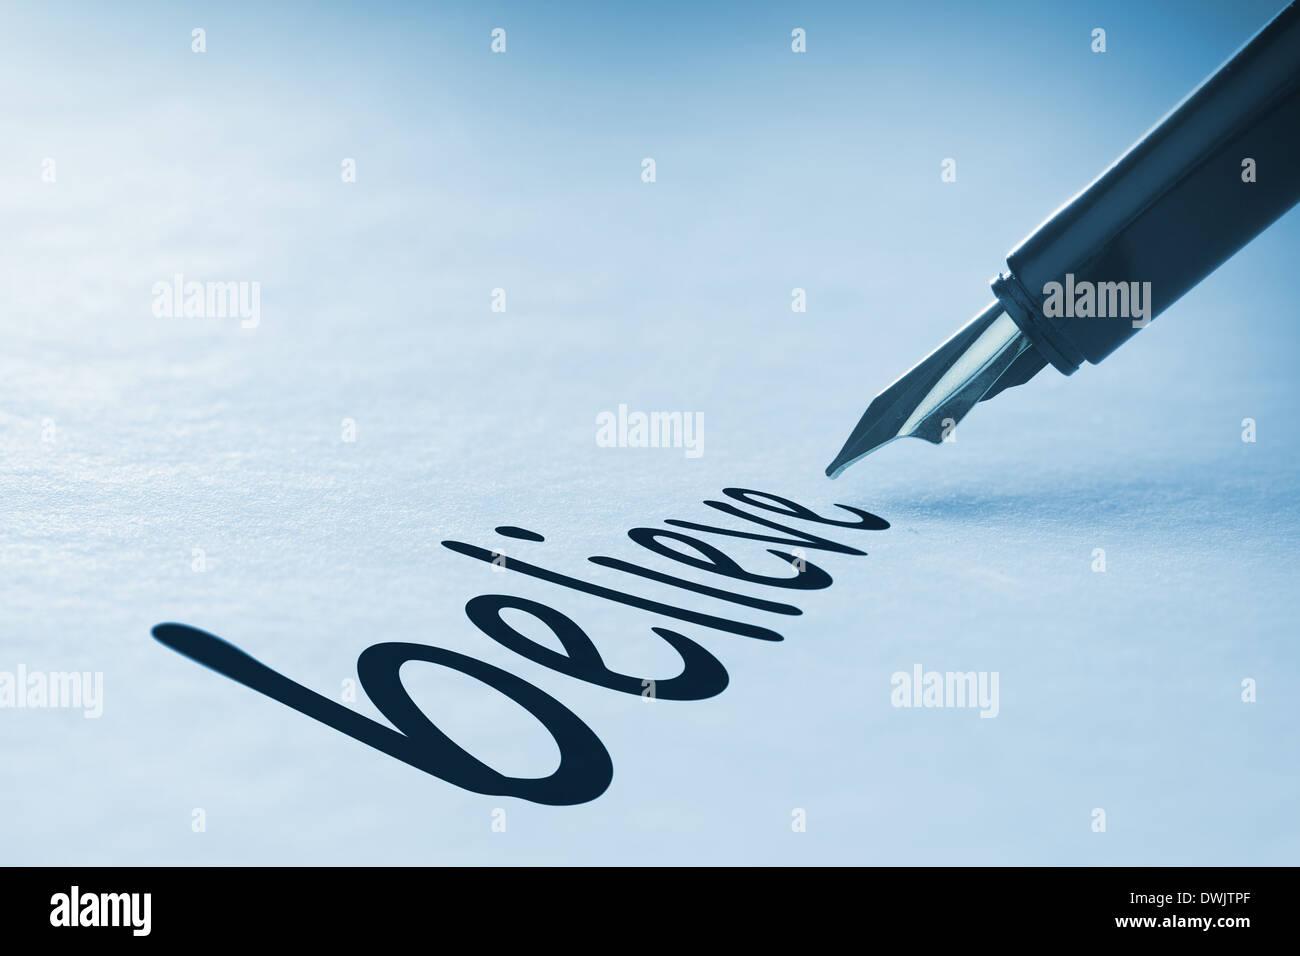 Fountain pen writing Believe - Stock Image